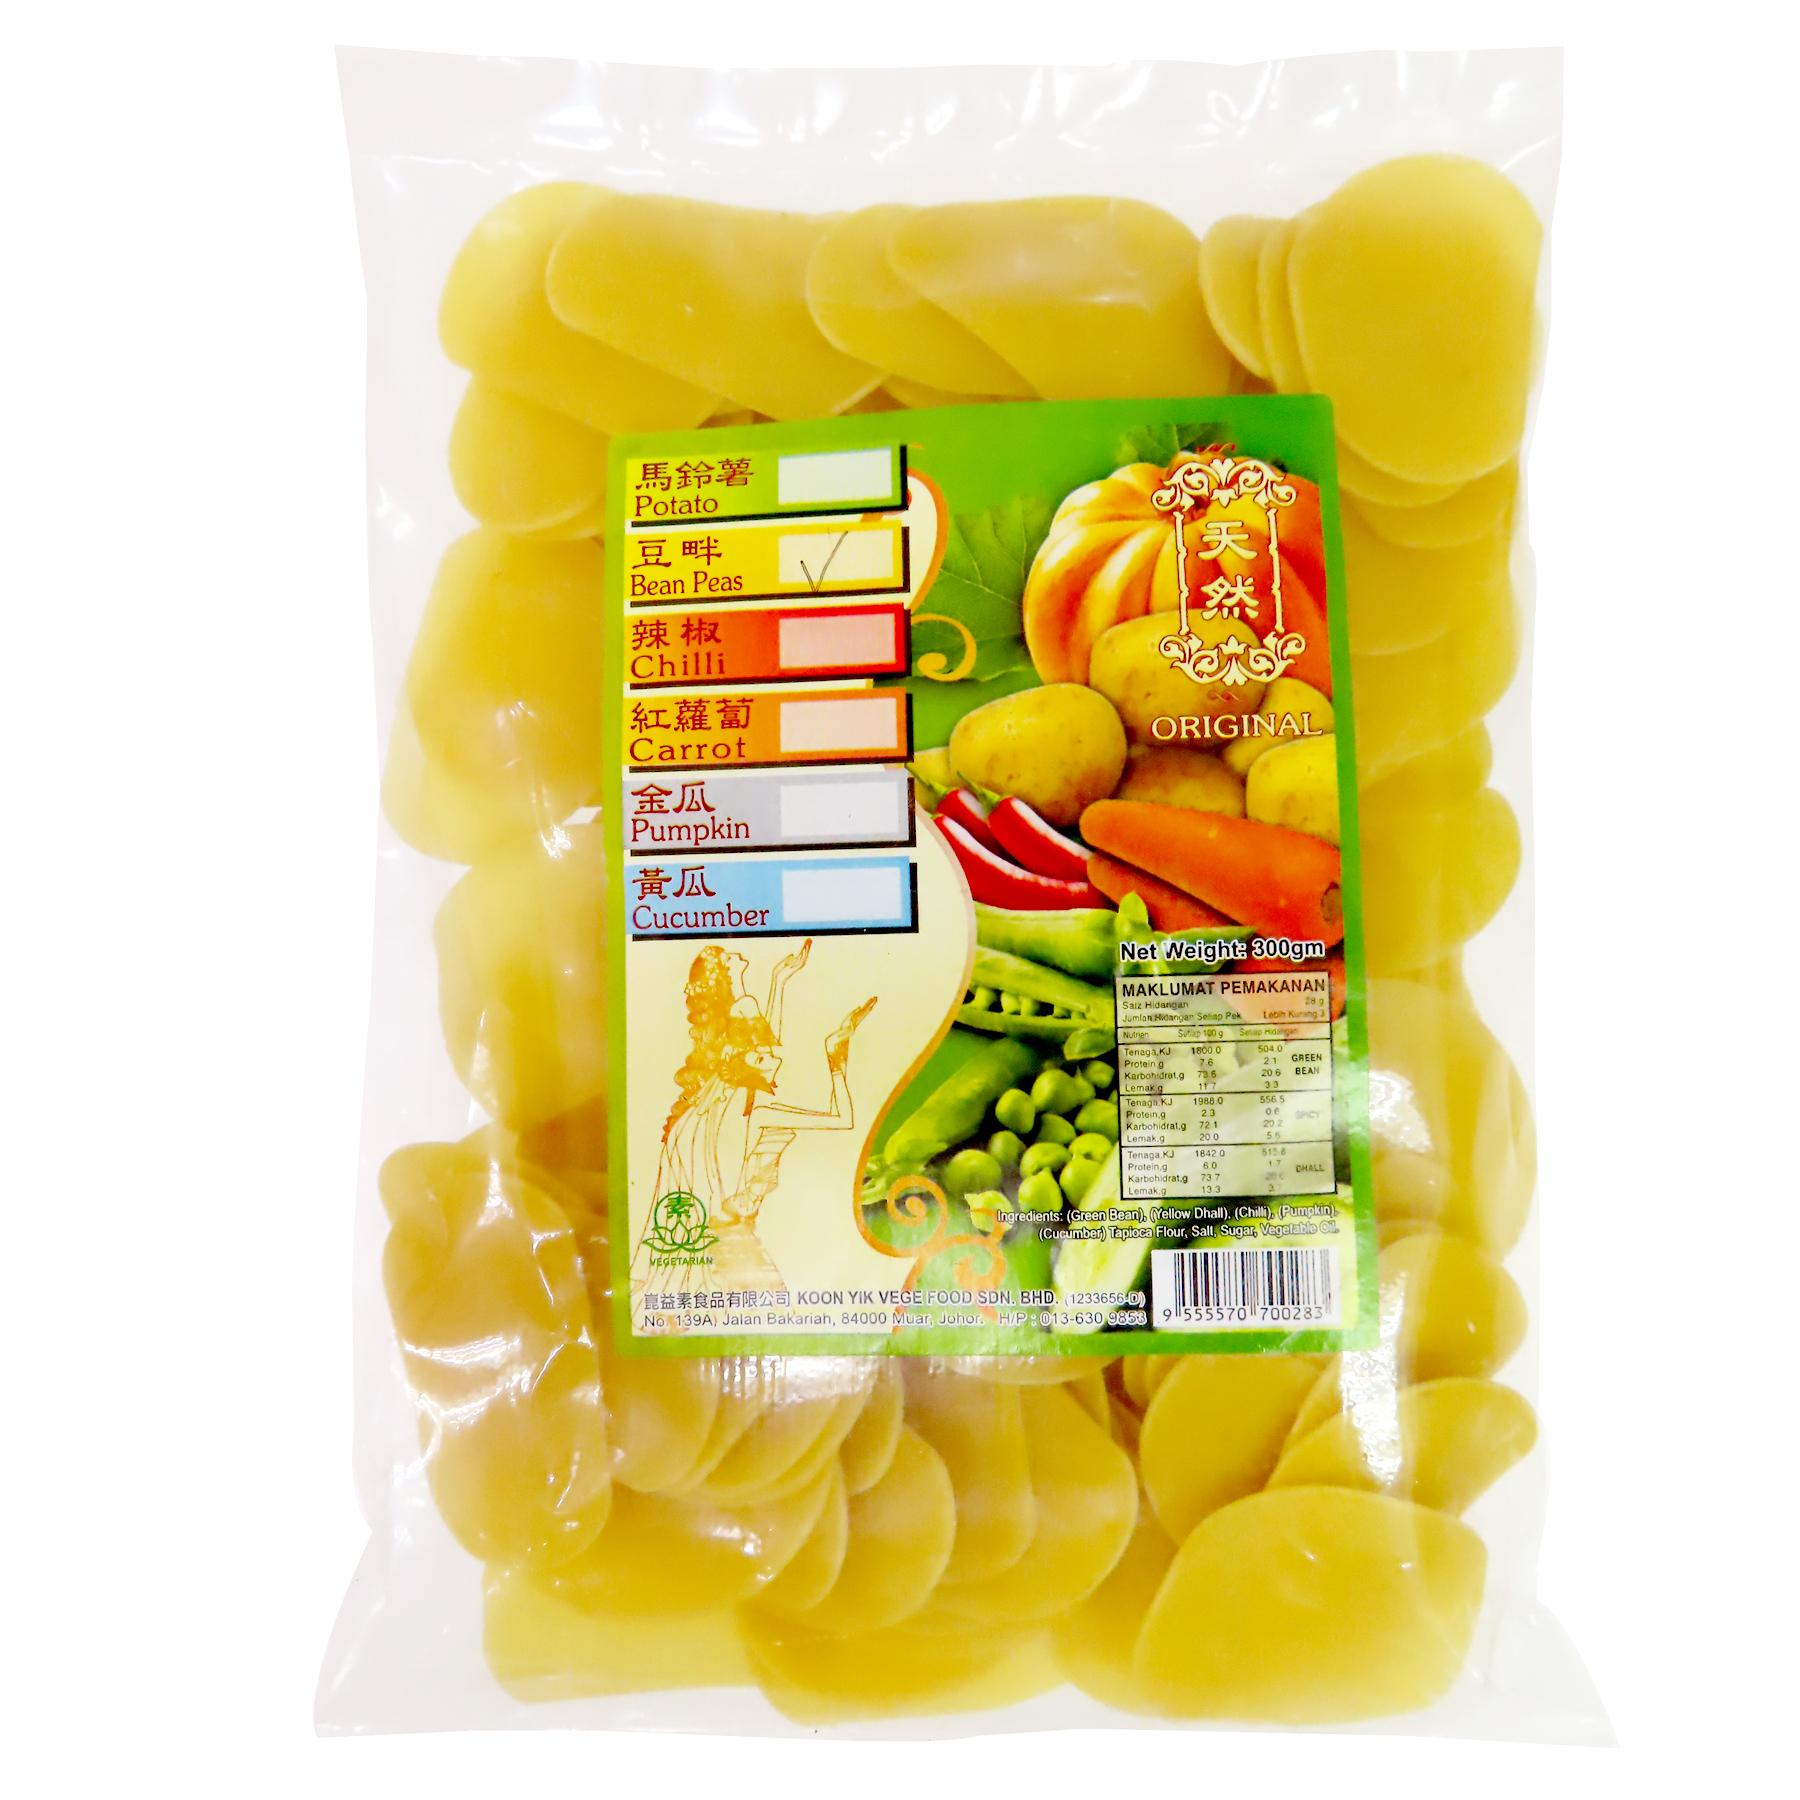 Image KY Original Bean Peas Crackers 昆益 - 天然豆畔生片 350grams